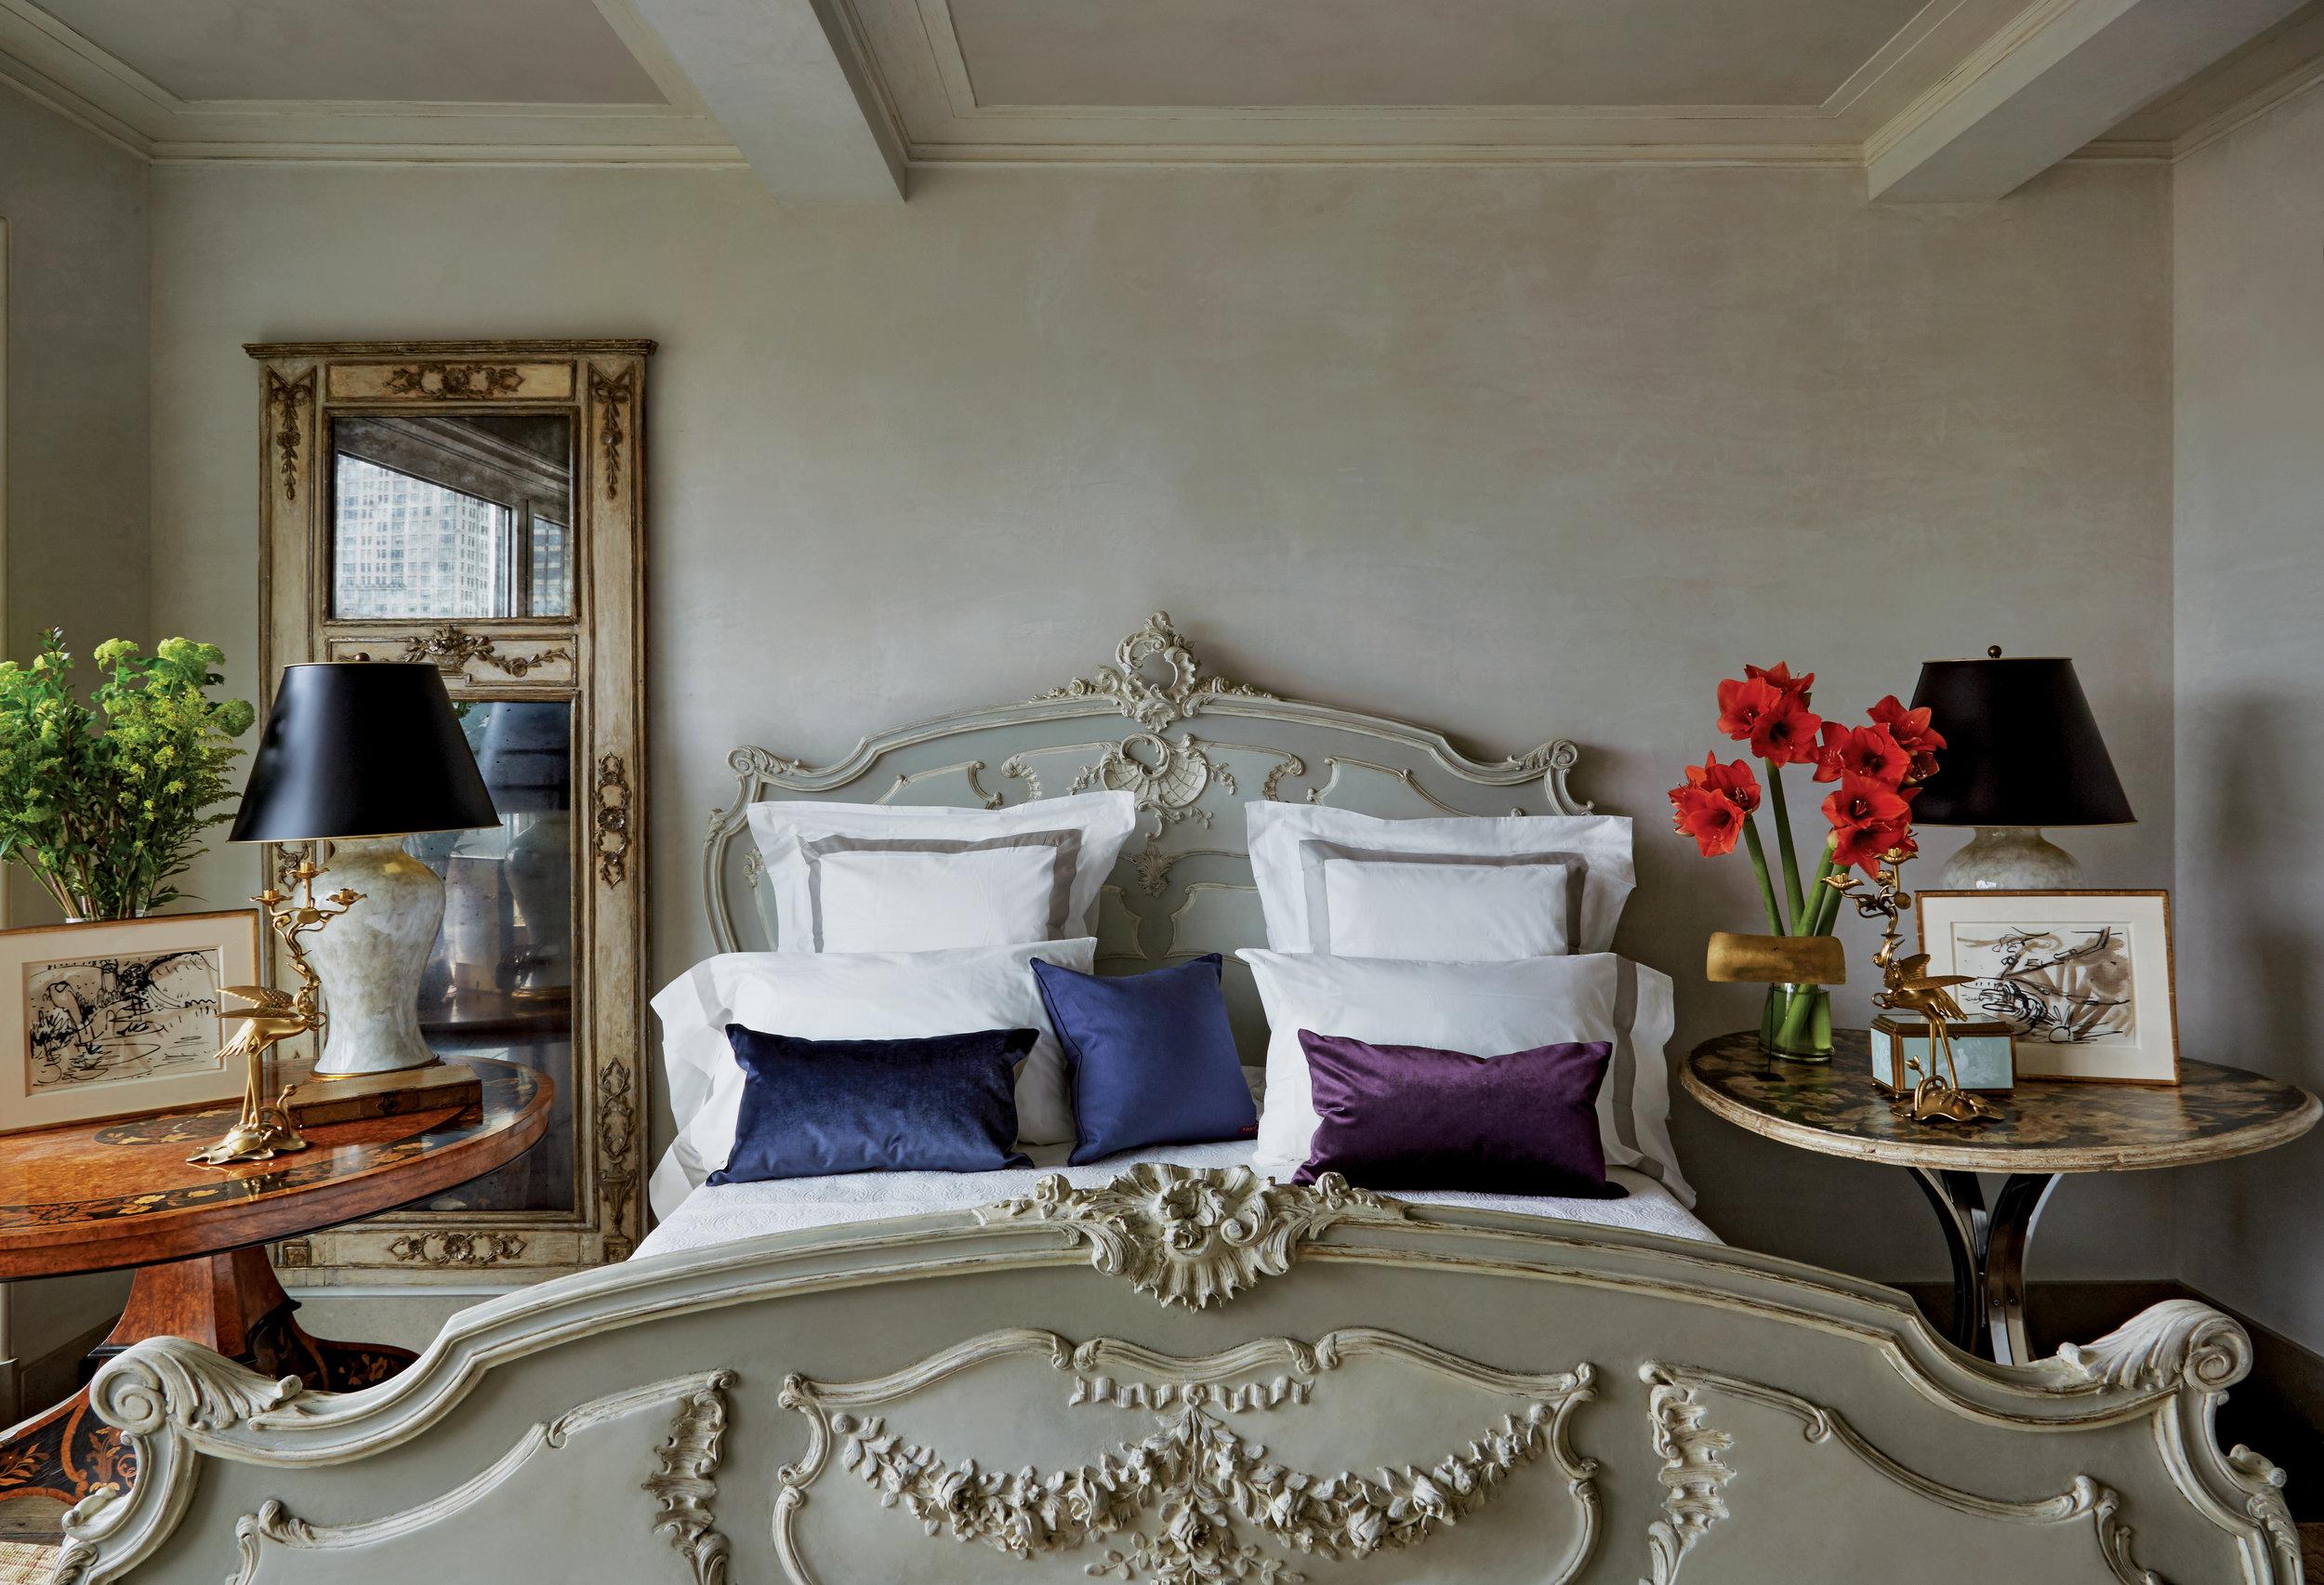 beautiful parisian bedroom in A manhattan highrise